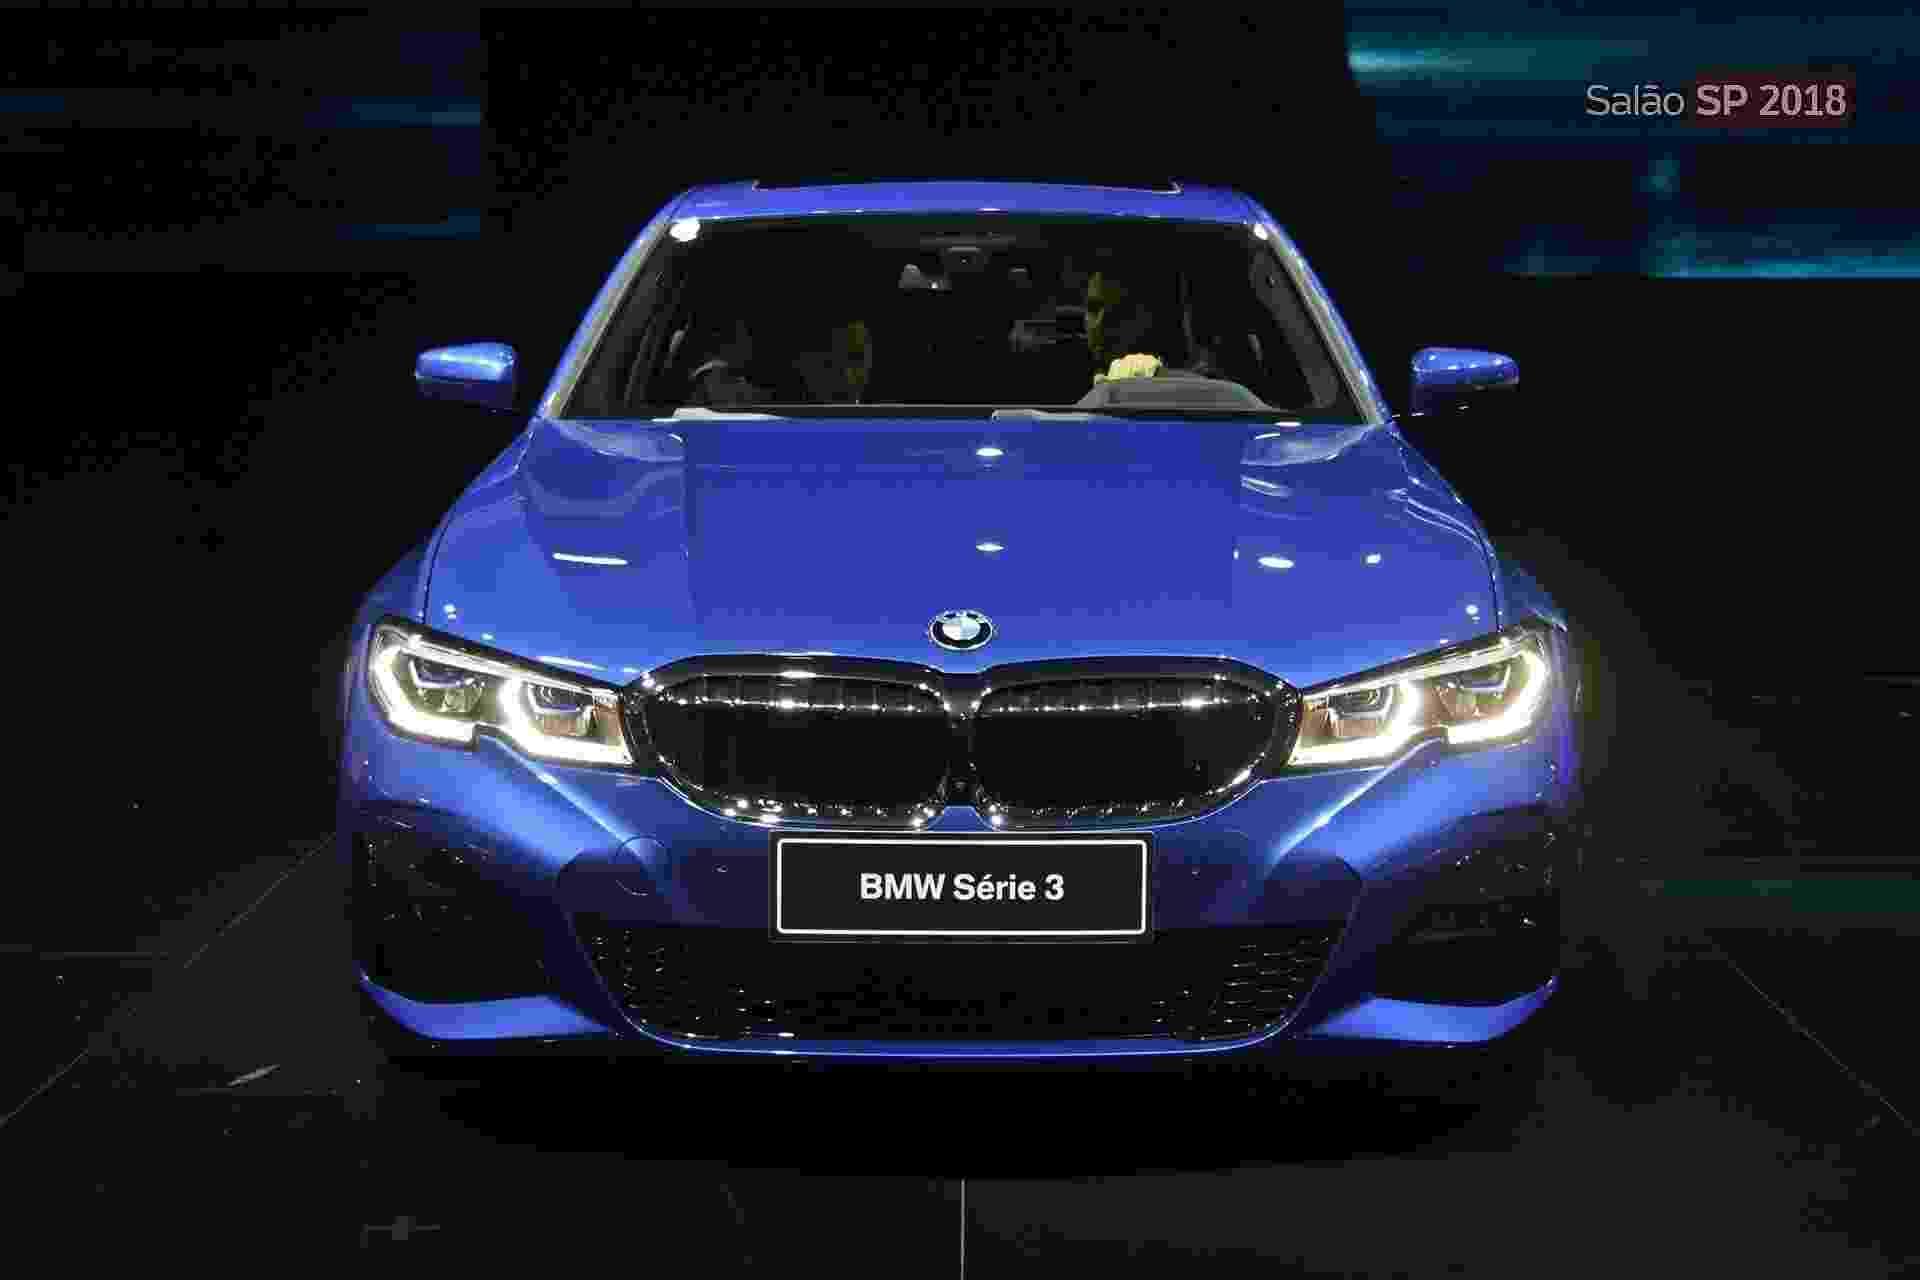 BMW Série 3 - Murilo Góes/UOL